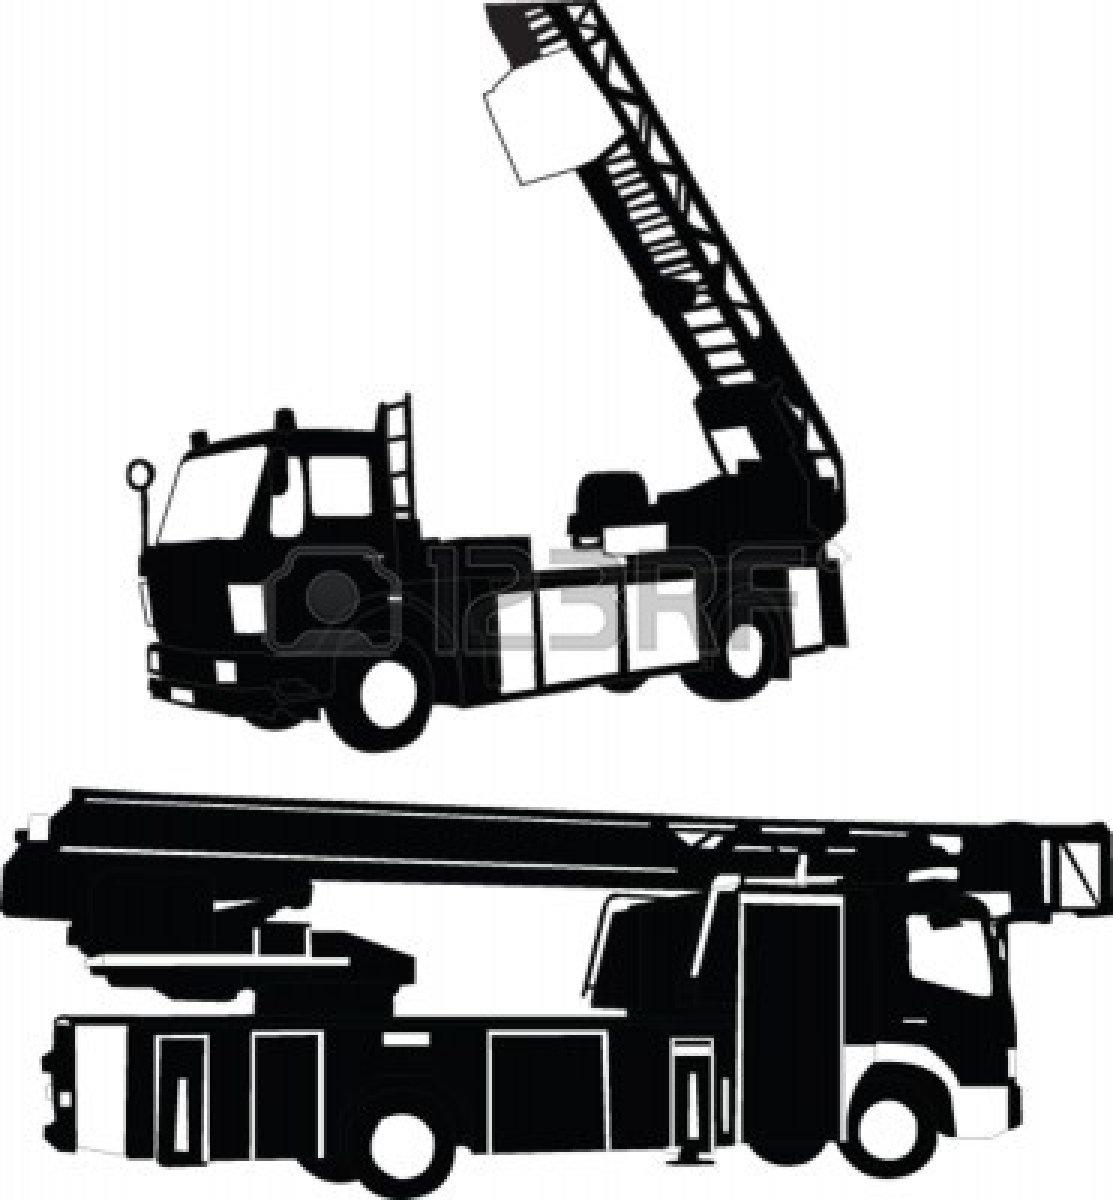 Simplified Firefighter Truck Clipart.